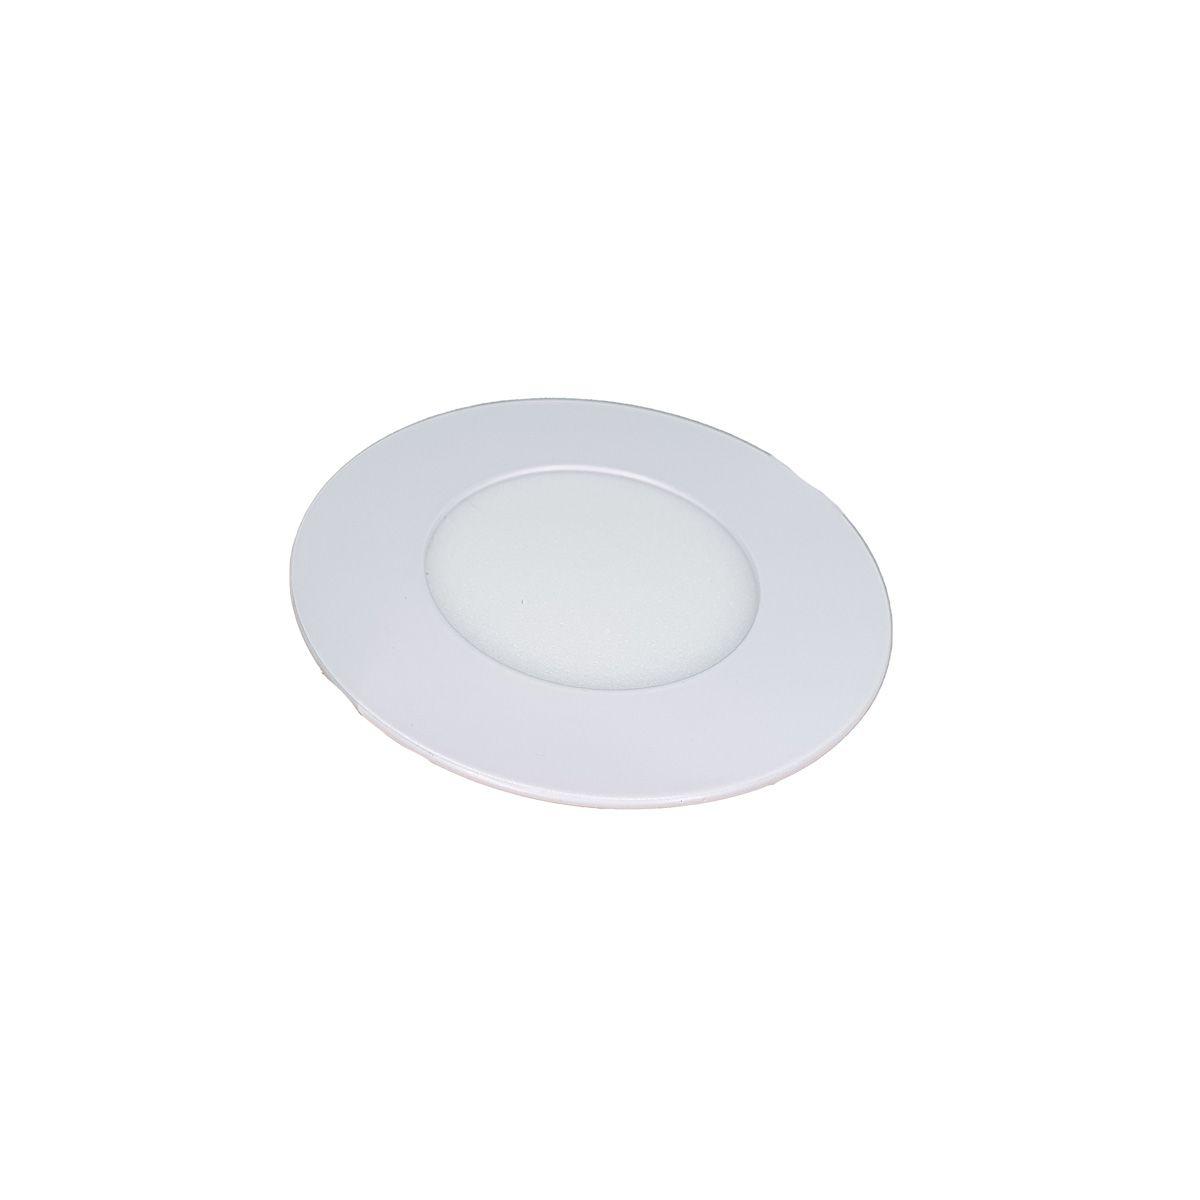 Painel Plafon LED 3w Redonda Luminaria Embutir Branco Luz Quente